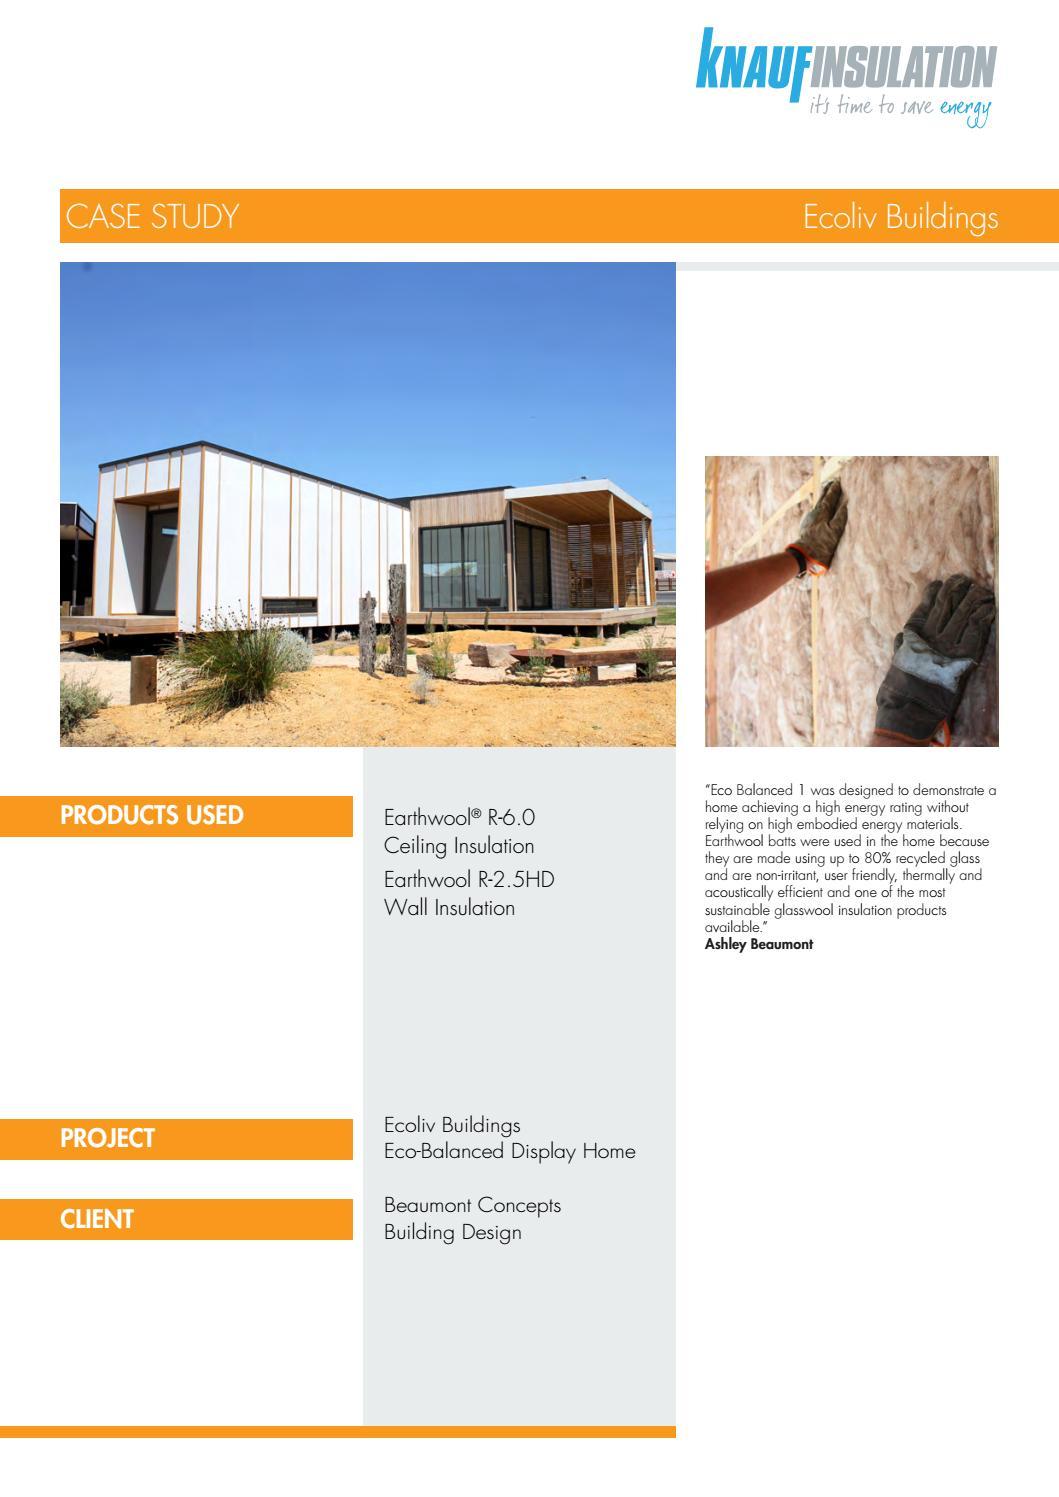 Earthwool® R-6 0 Ceiling Insulation by Earthwool Australia